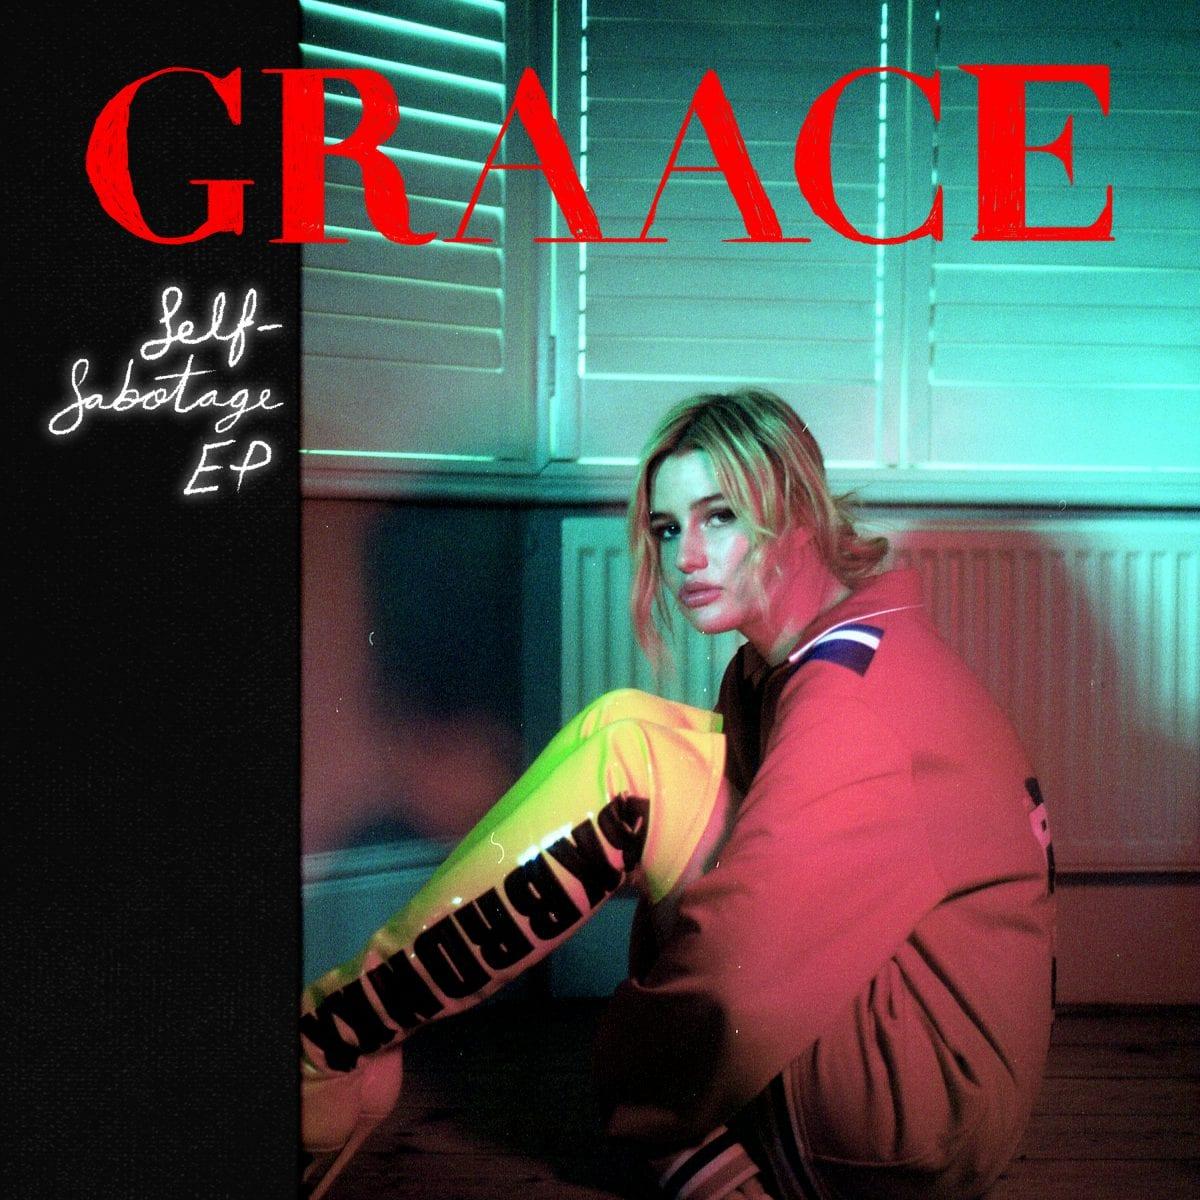 Self-Sabotage-EP-GRAACE